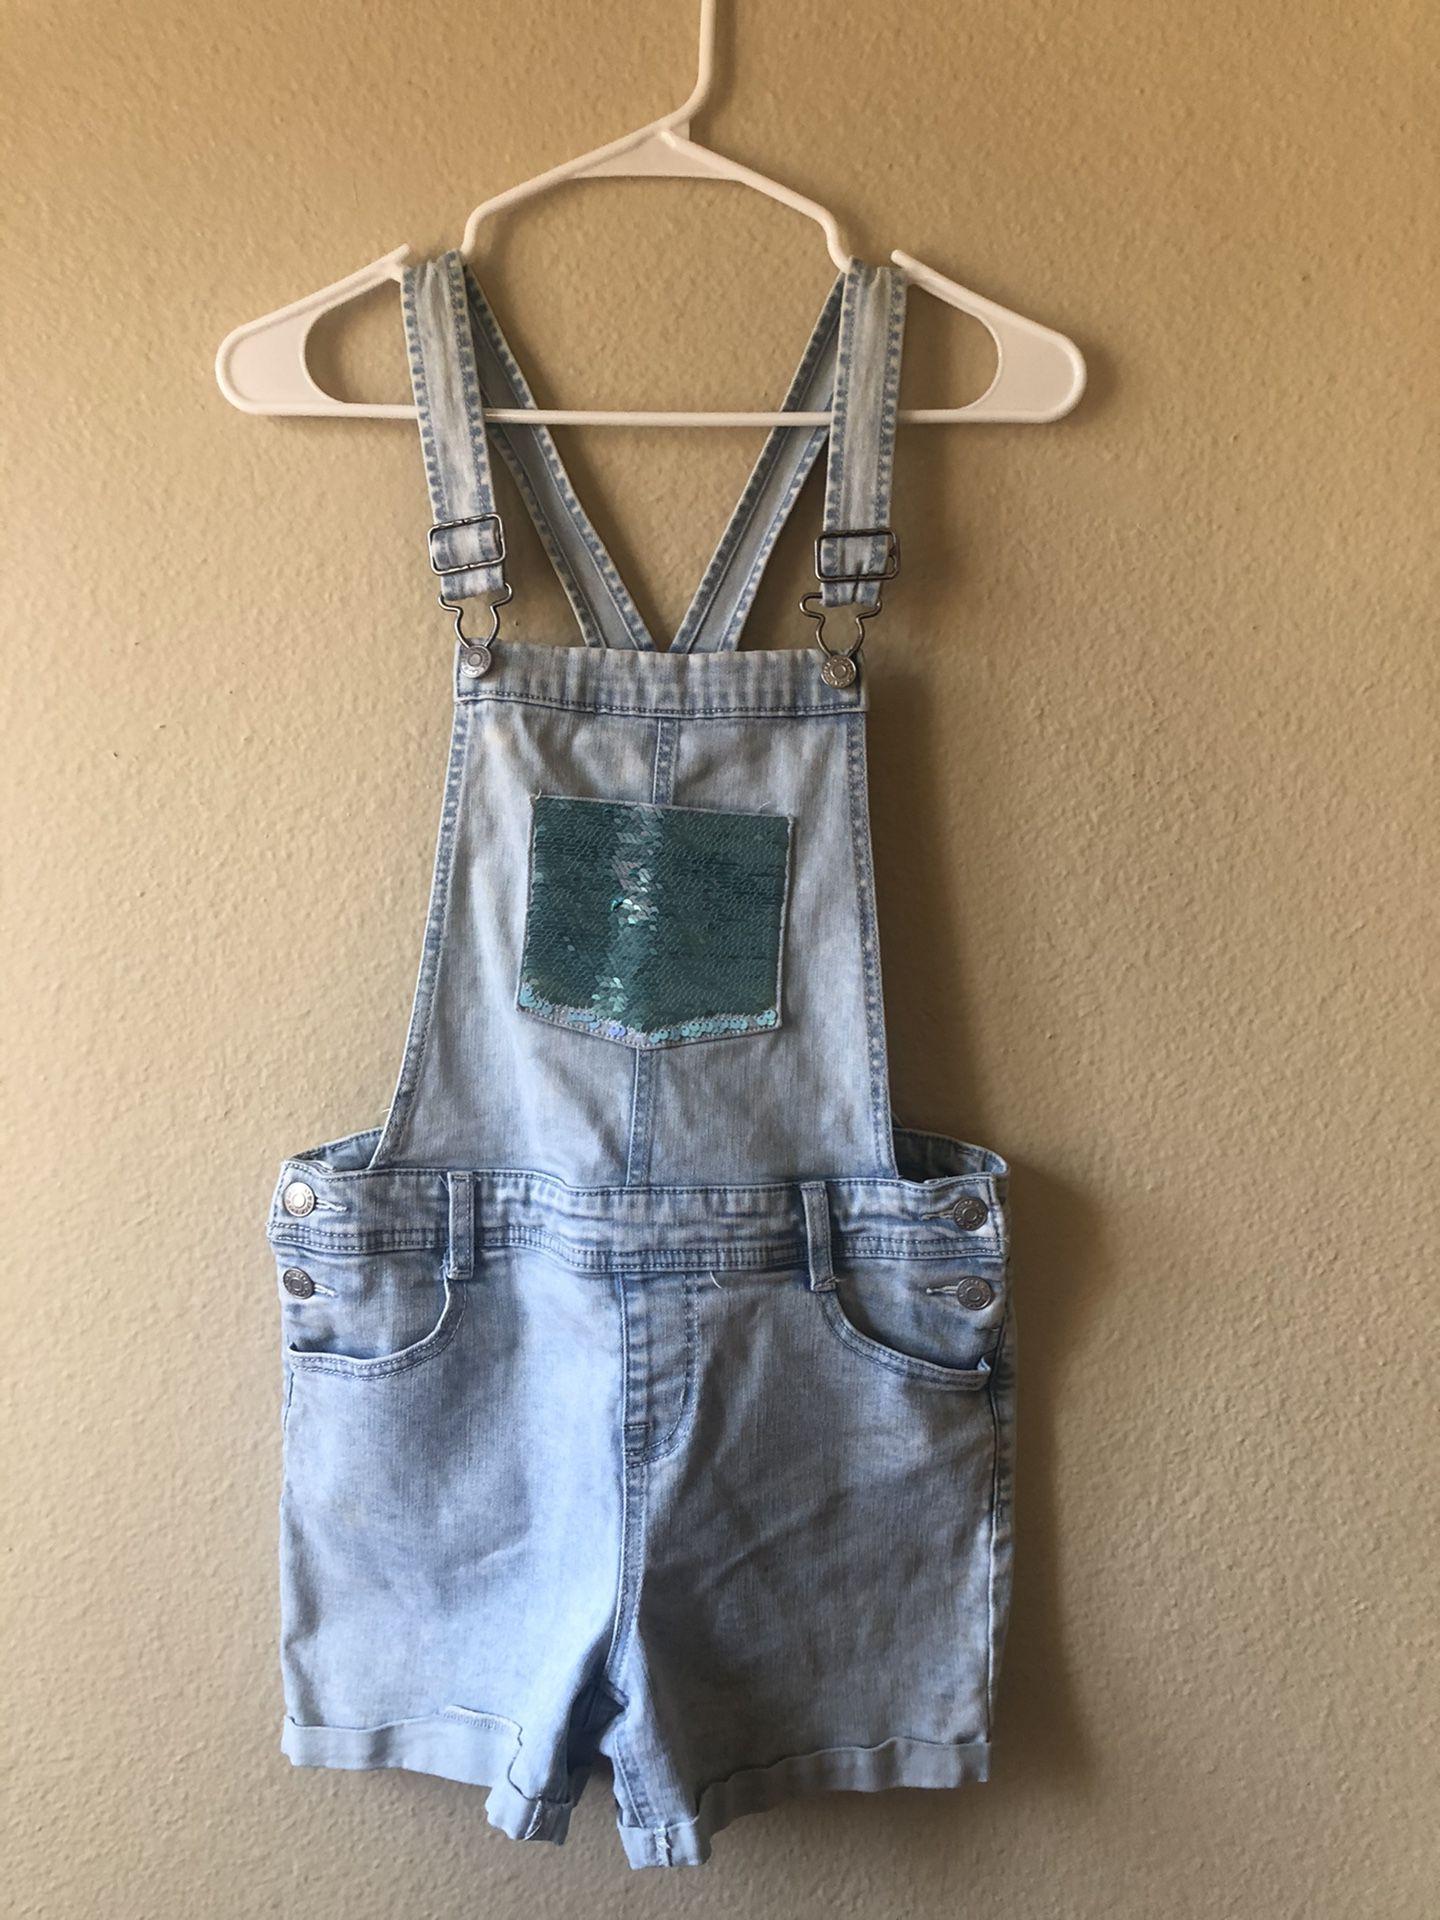 Girls Gently Used Clothing